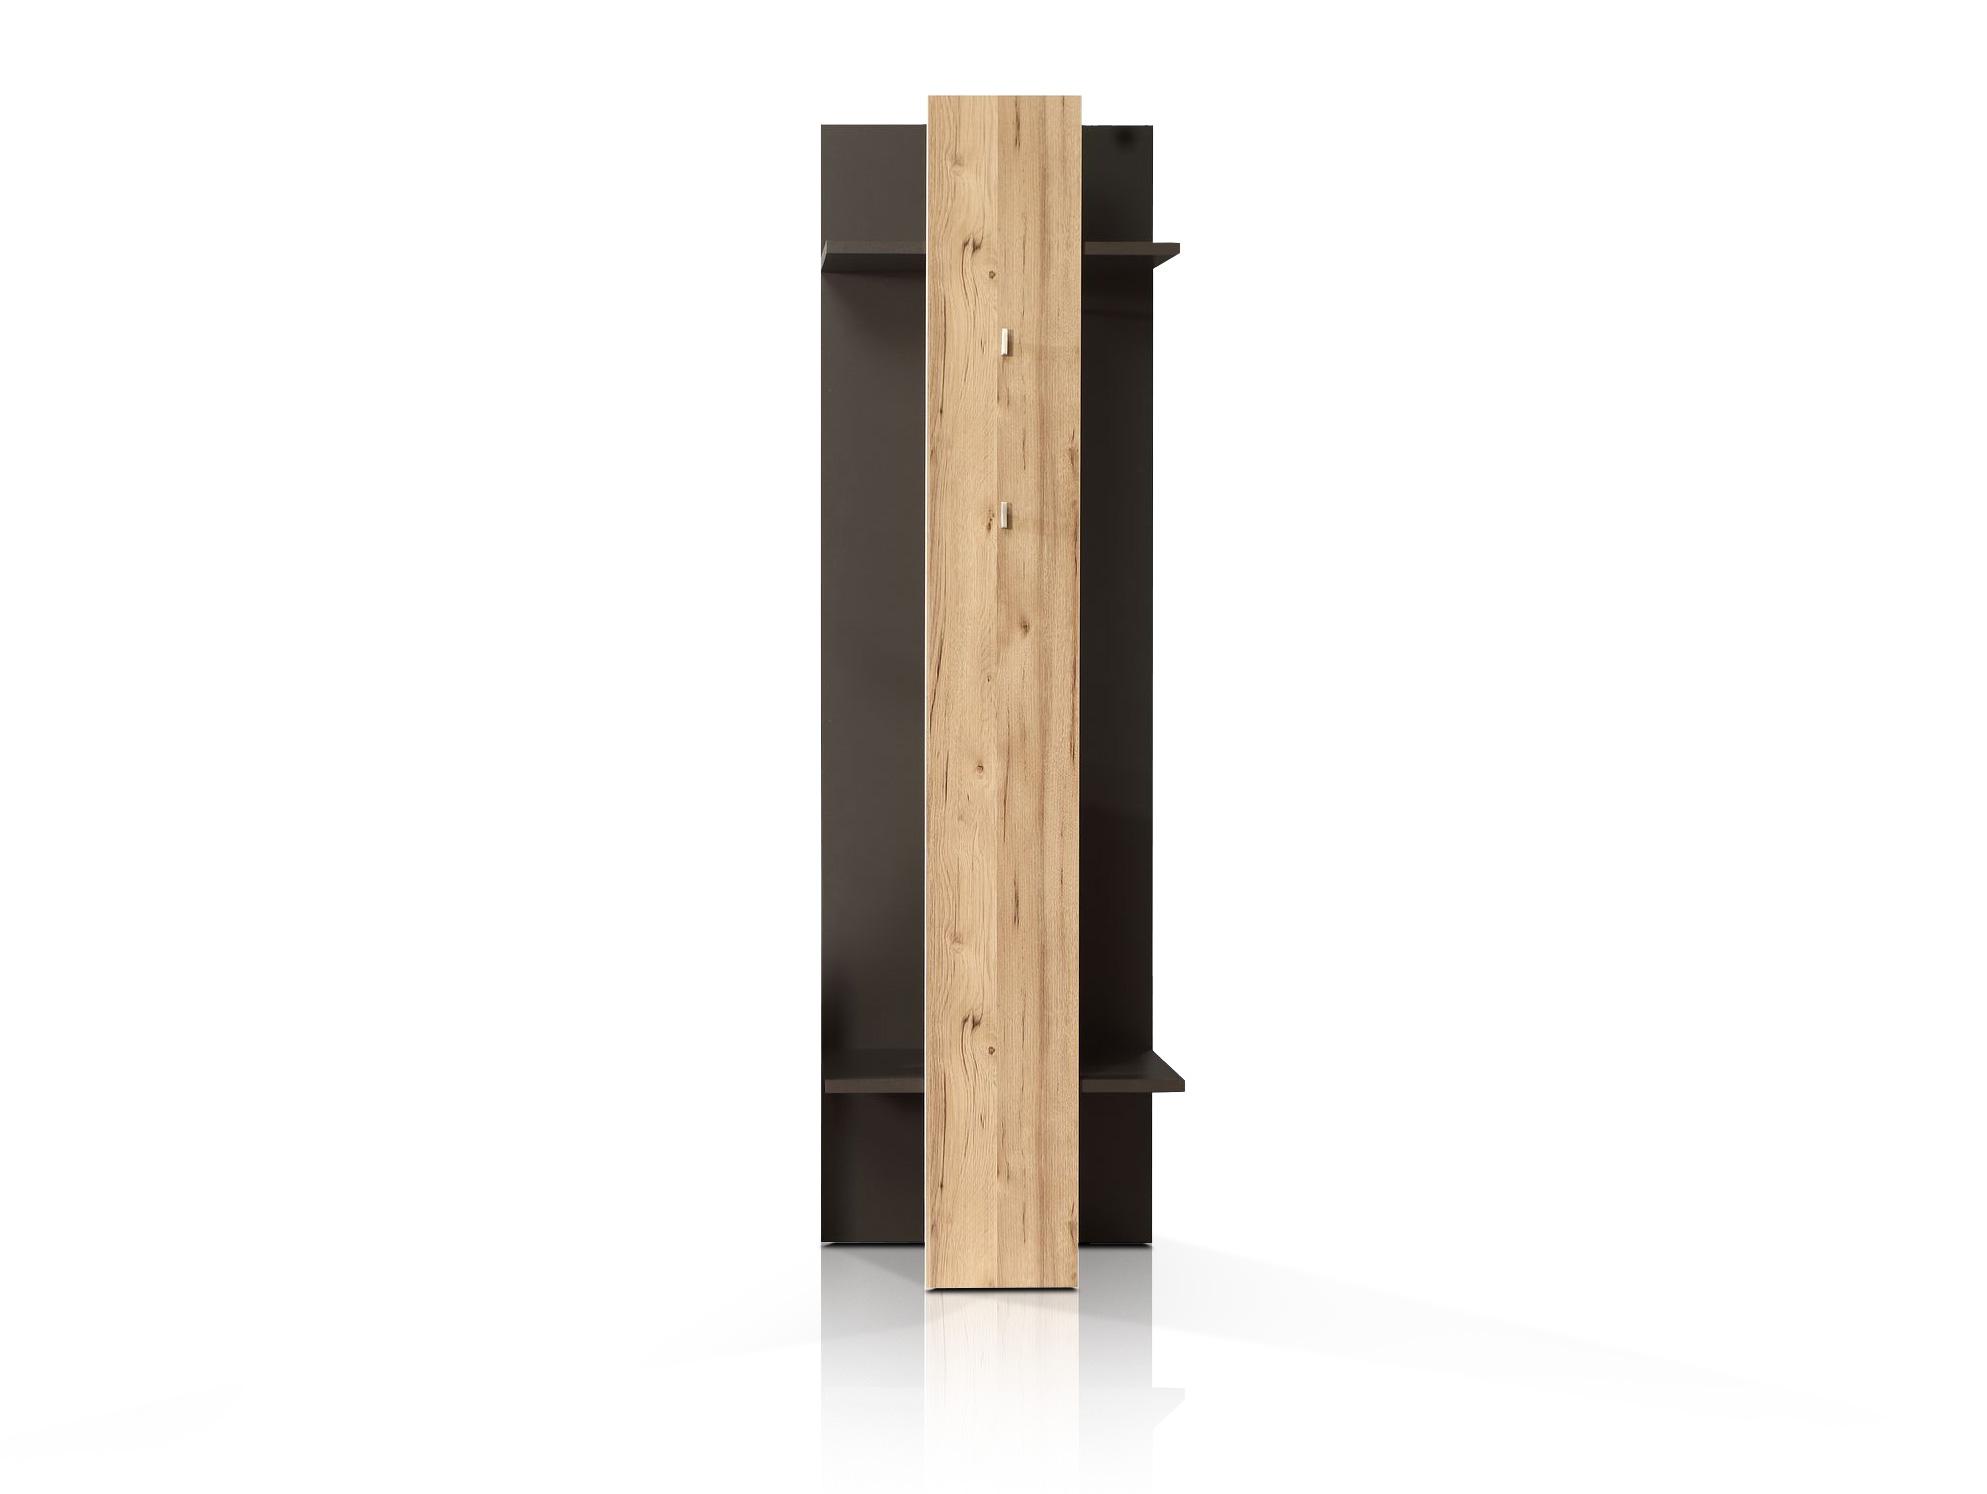 clara garderobenpaneel grau planked eiche